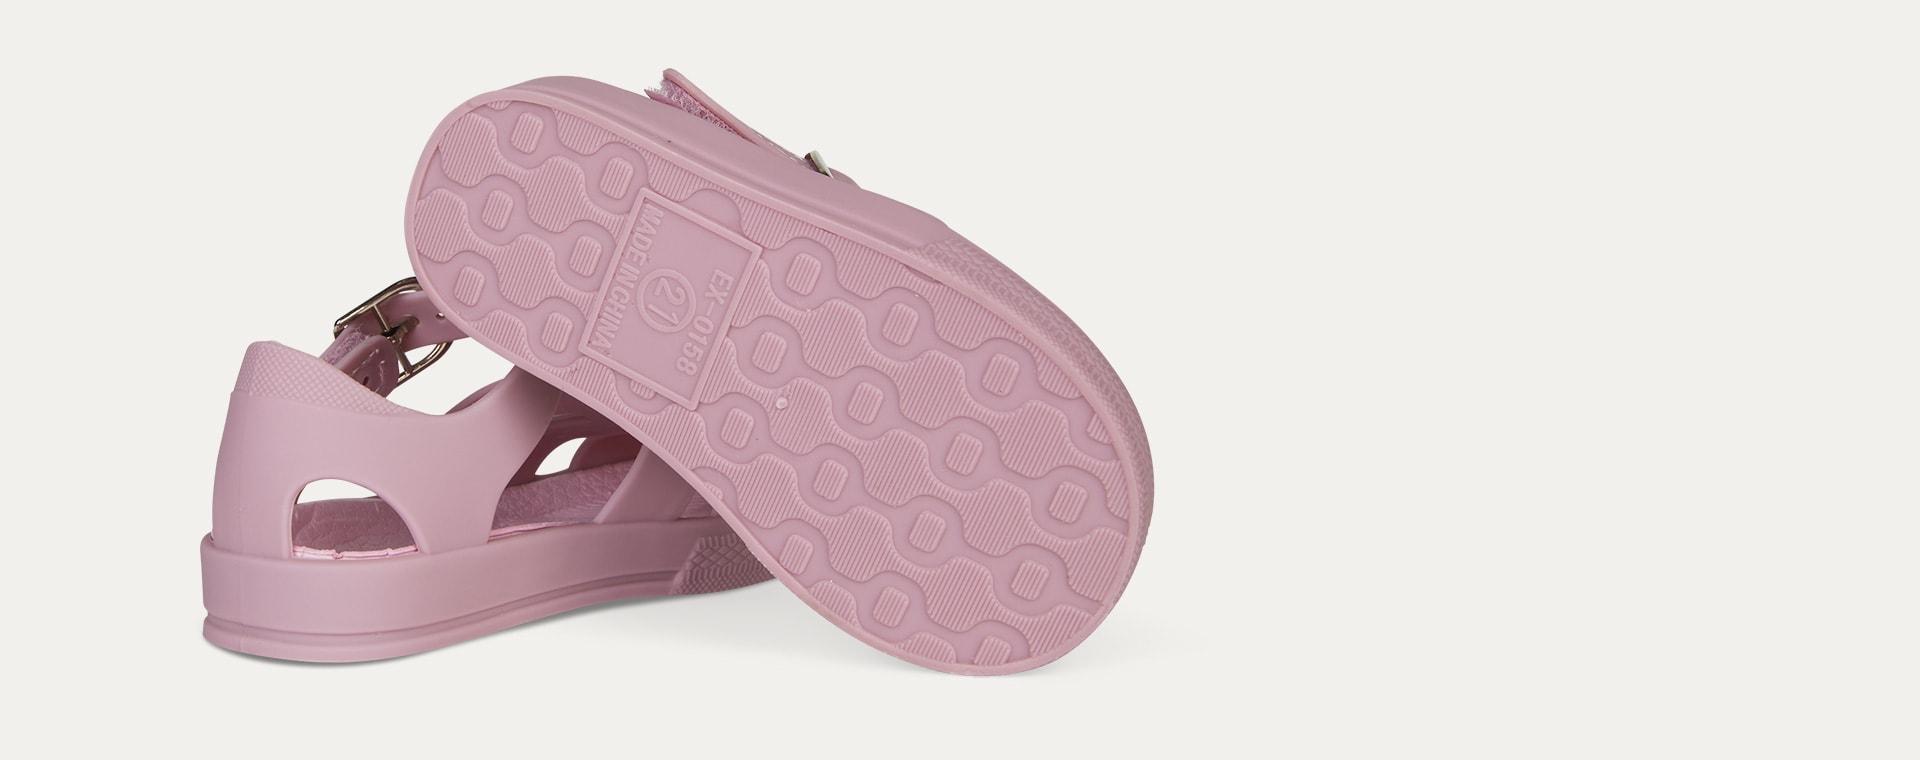 Rose KIDLY Label Jelly Sandal